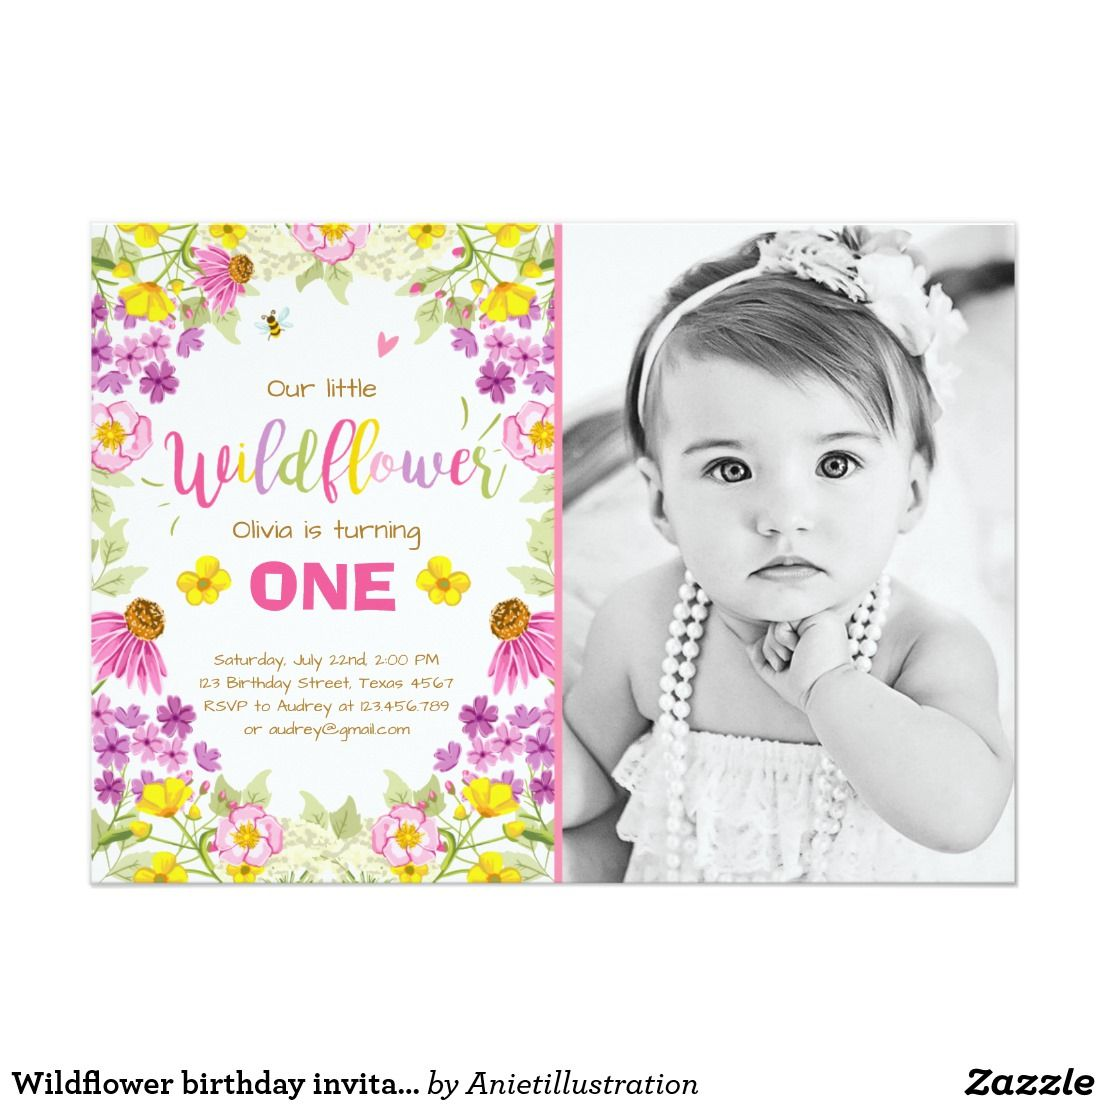 Wildflower birthday invitation Floral Girl pink | Avery\'s Third ...